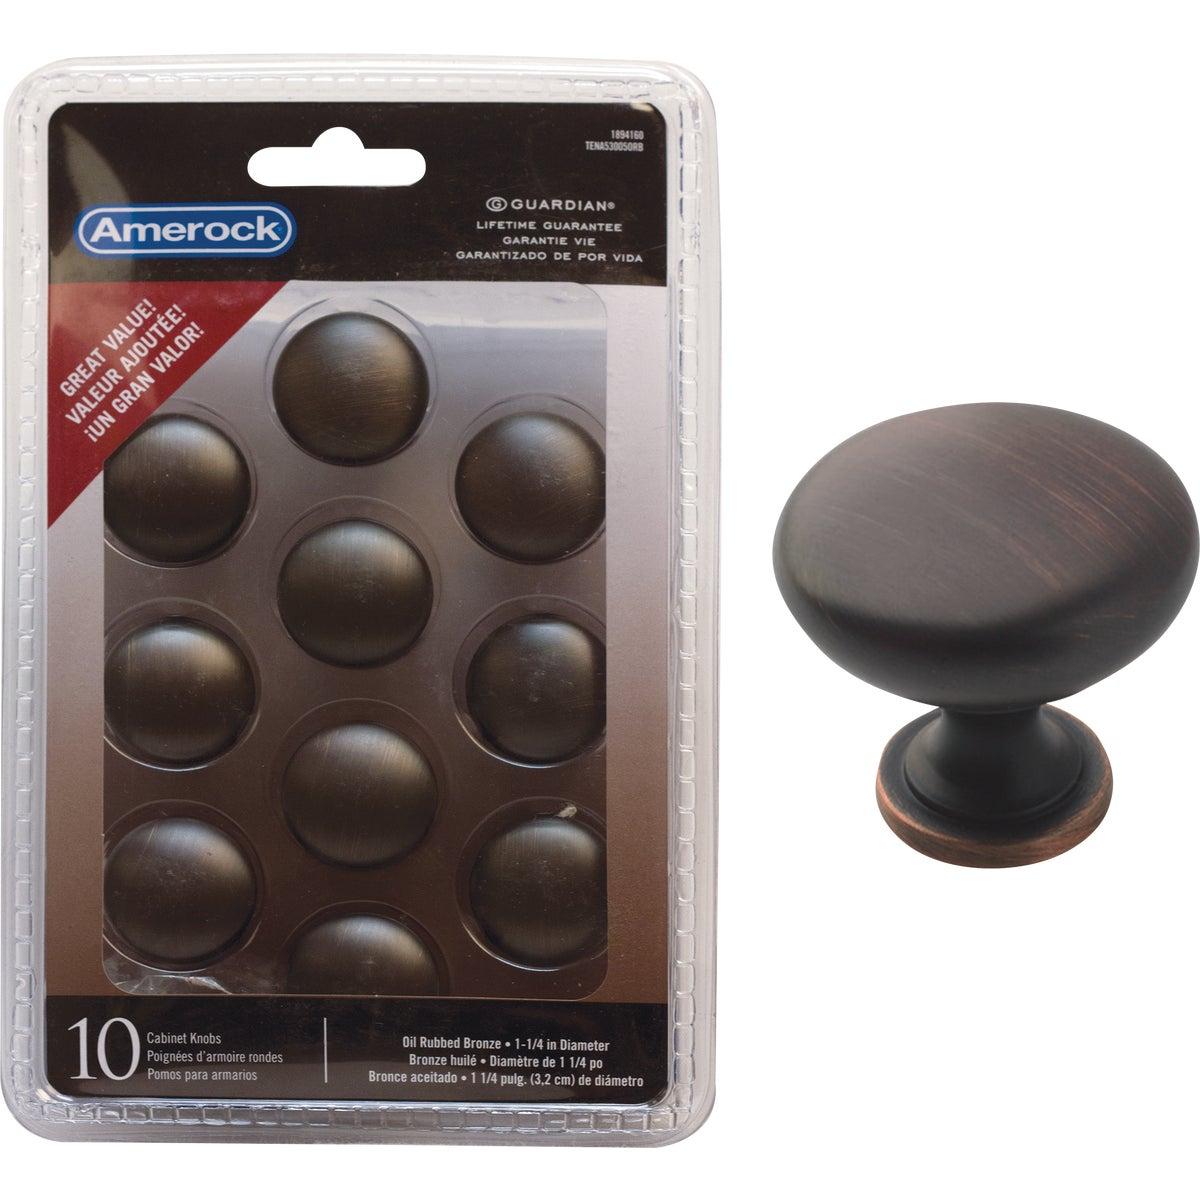 Amerock Allison Edona Oil Rubbed Bronze 1-1/4 In. Cabinet Knob, (10-Pack)